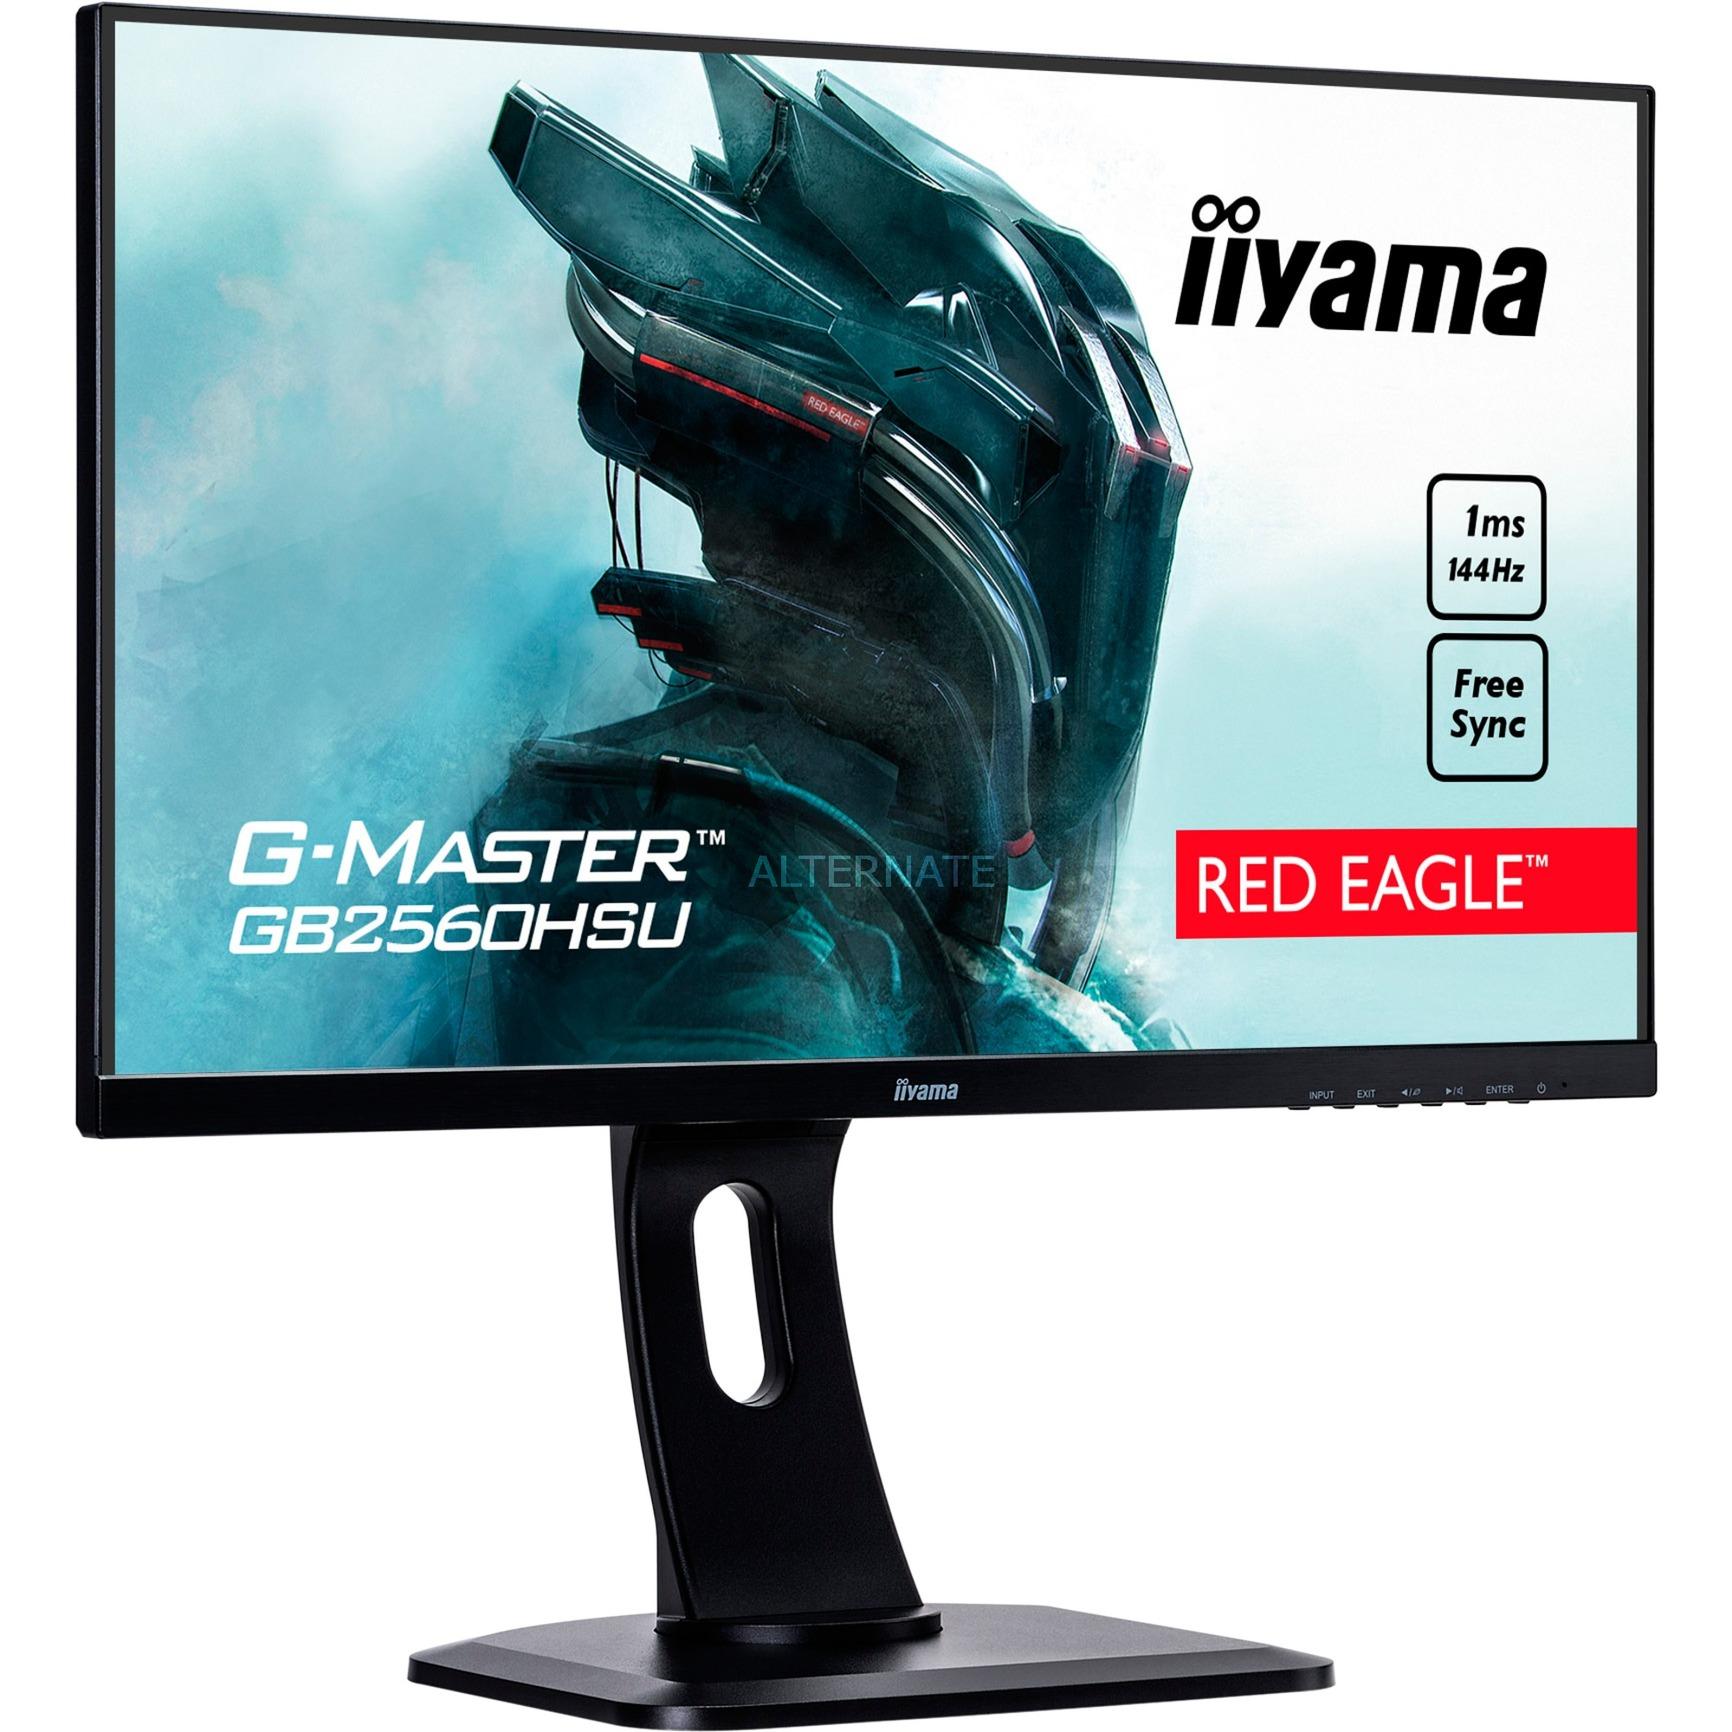 "G-MASTER GB2560HSU-B1 LED display 62,2 cm (24.5"") Full HD LCD Plana Mate Negro, Monitor LED"